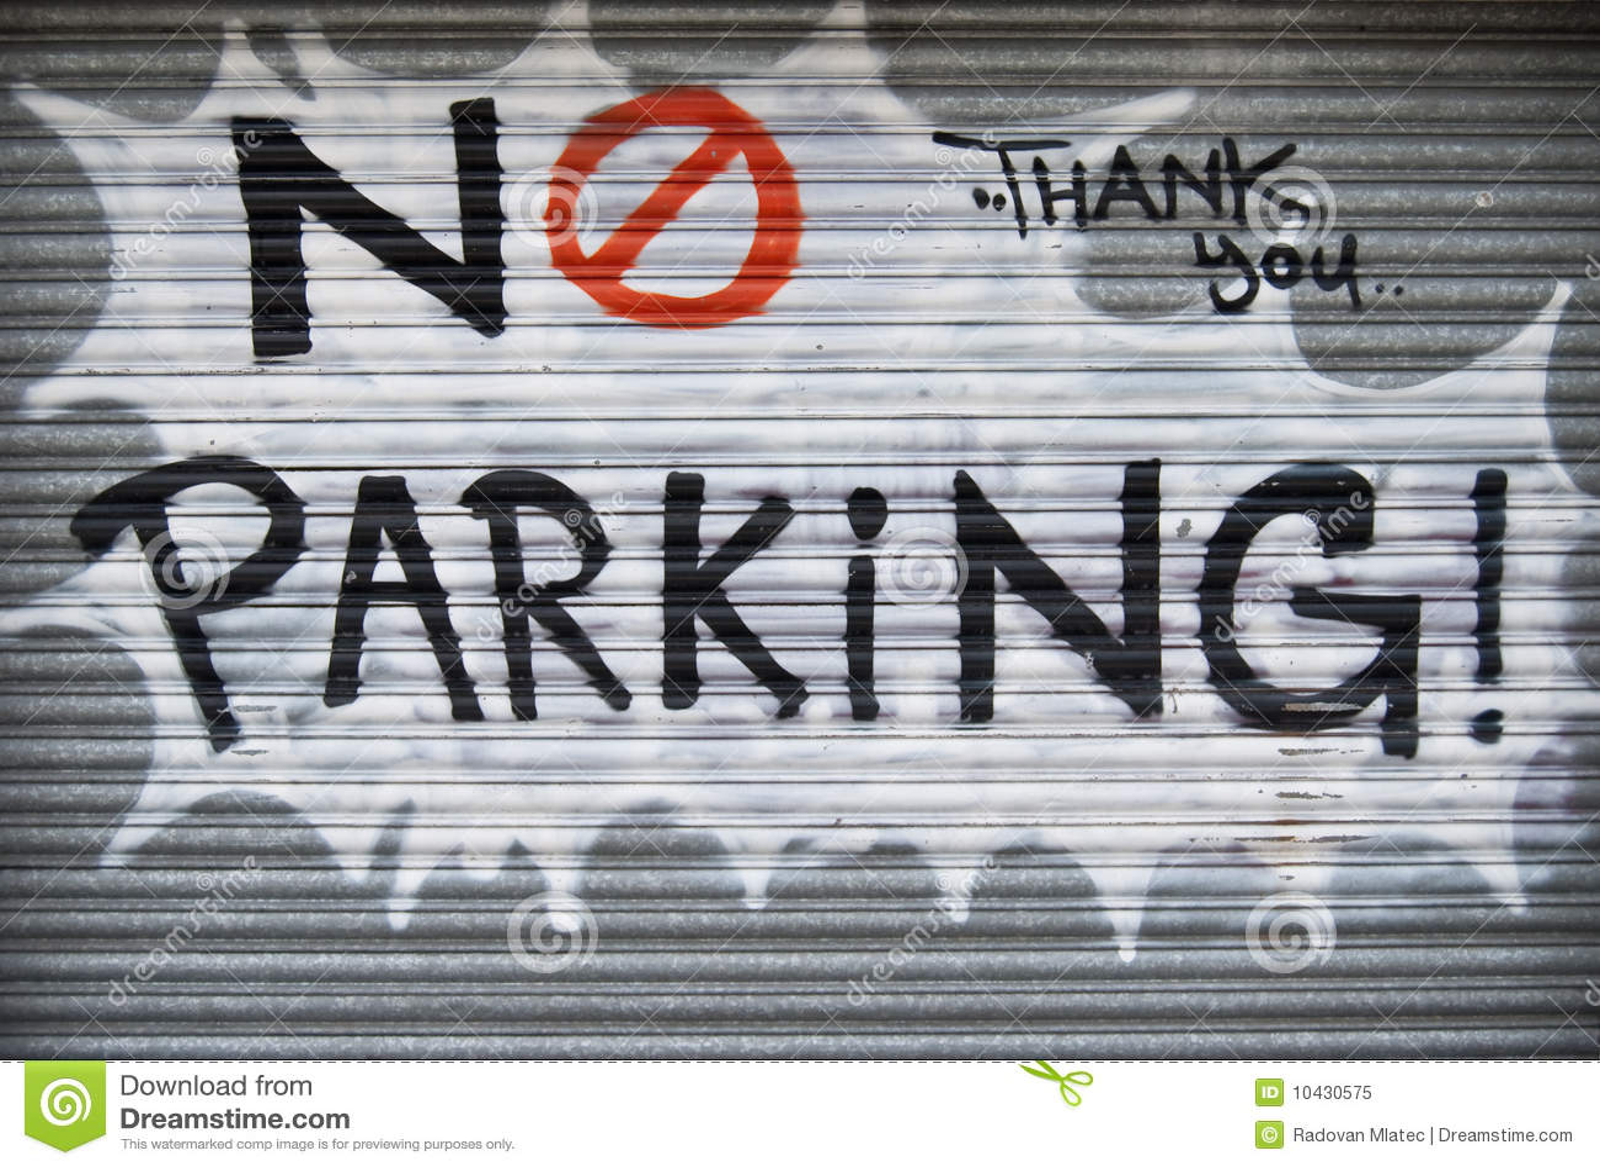 No parking graffiti